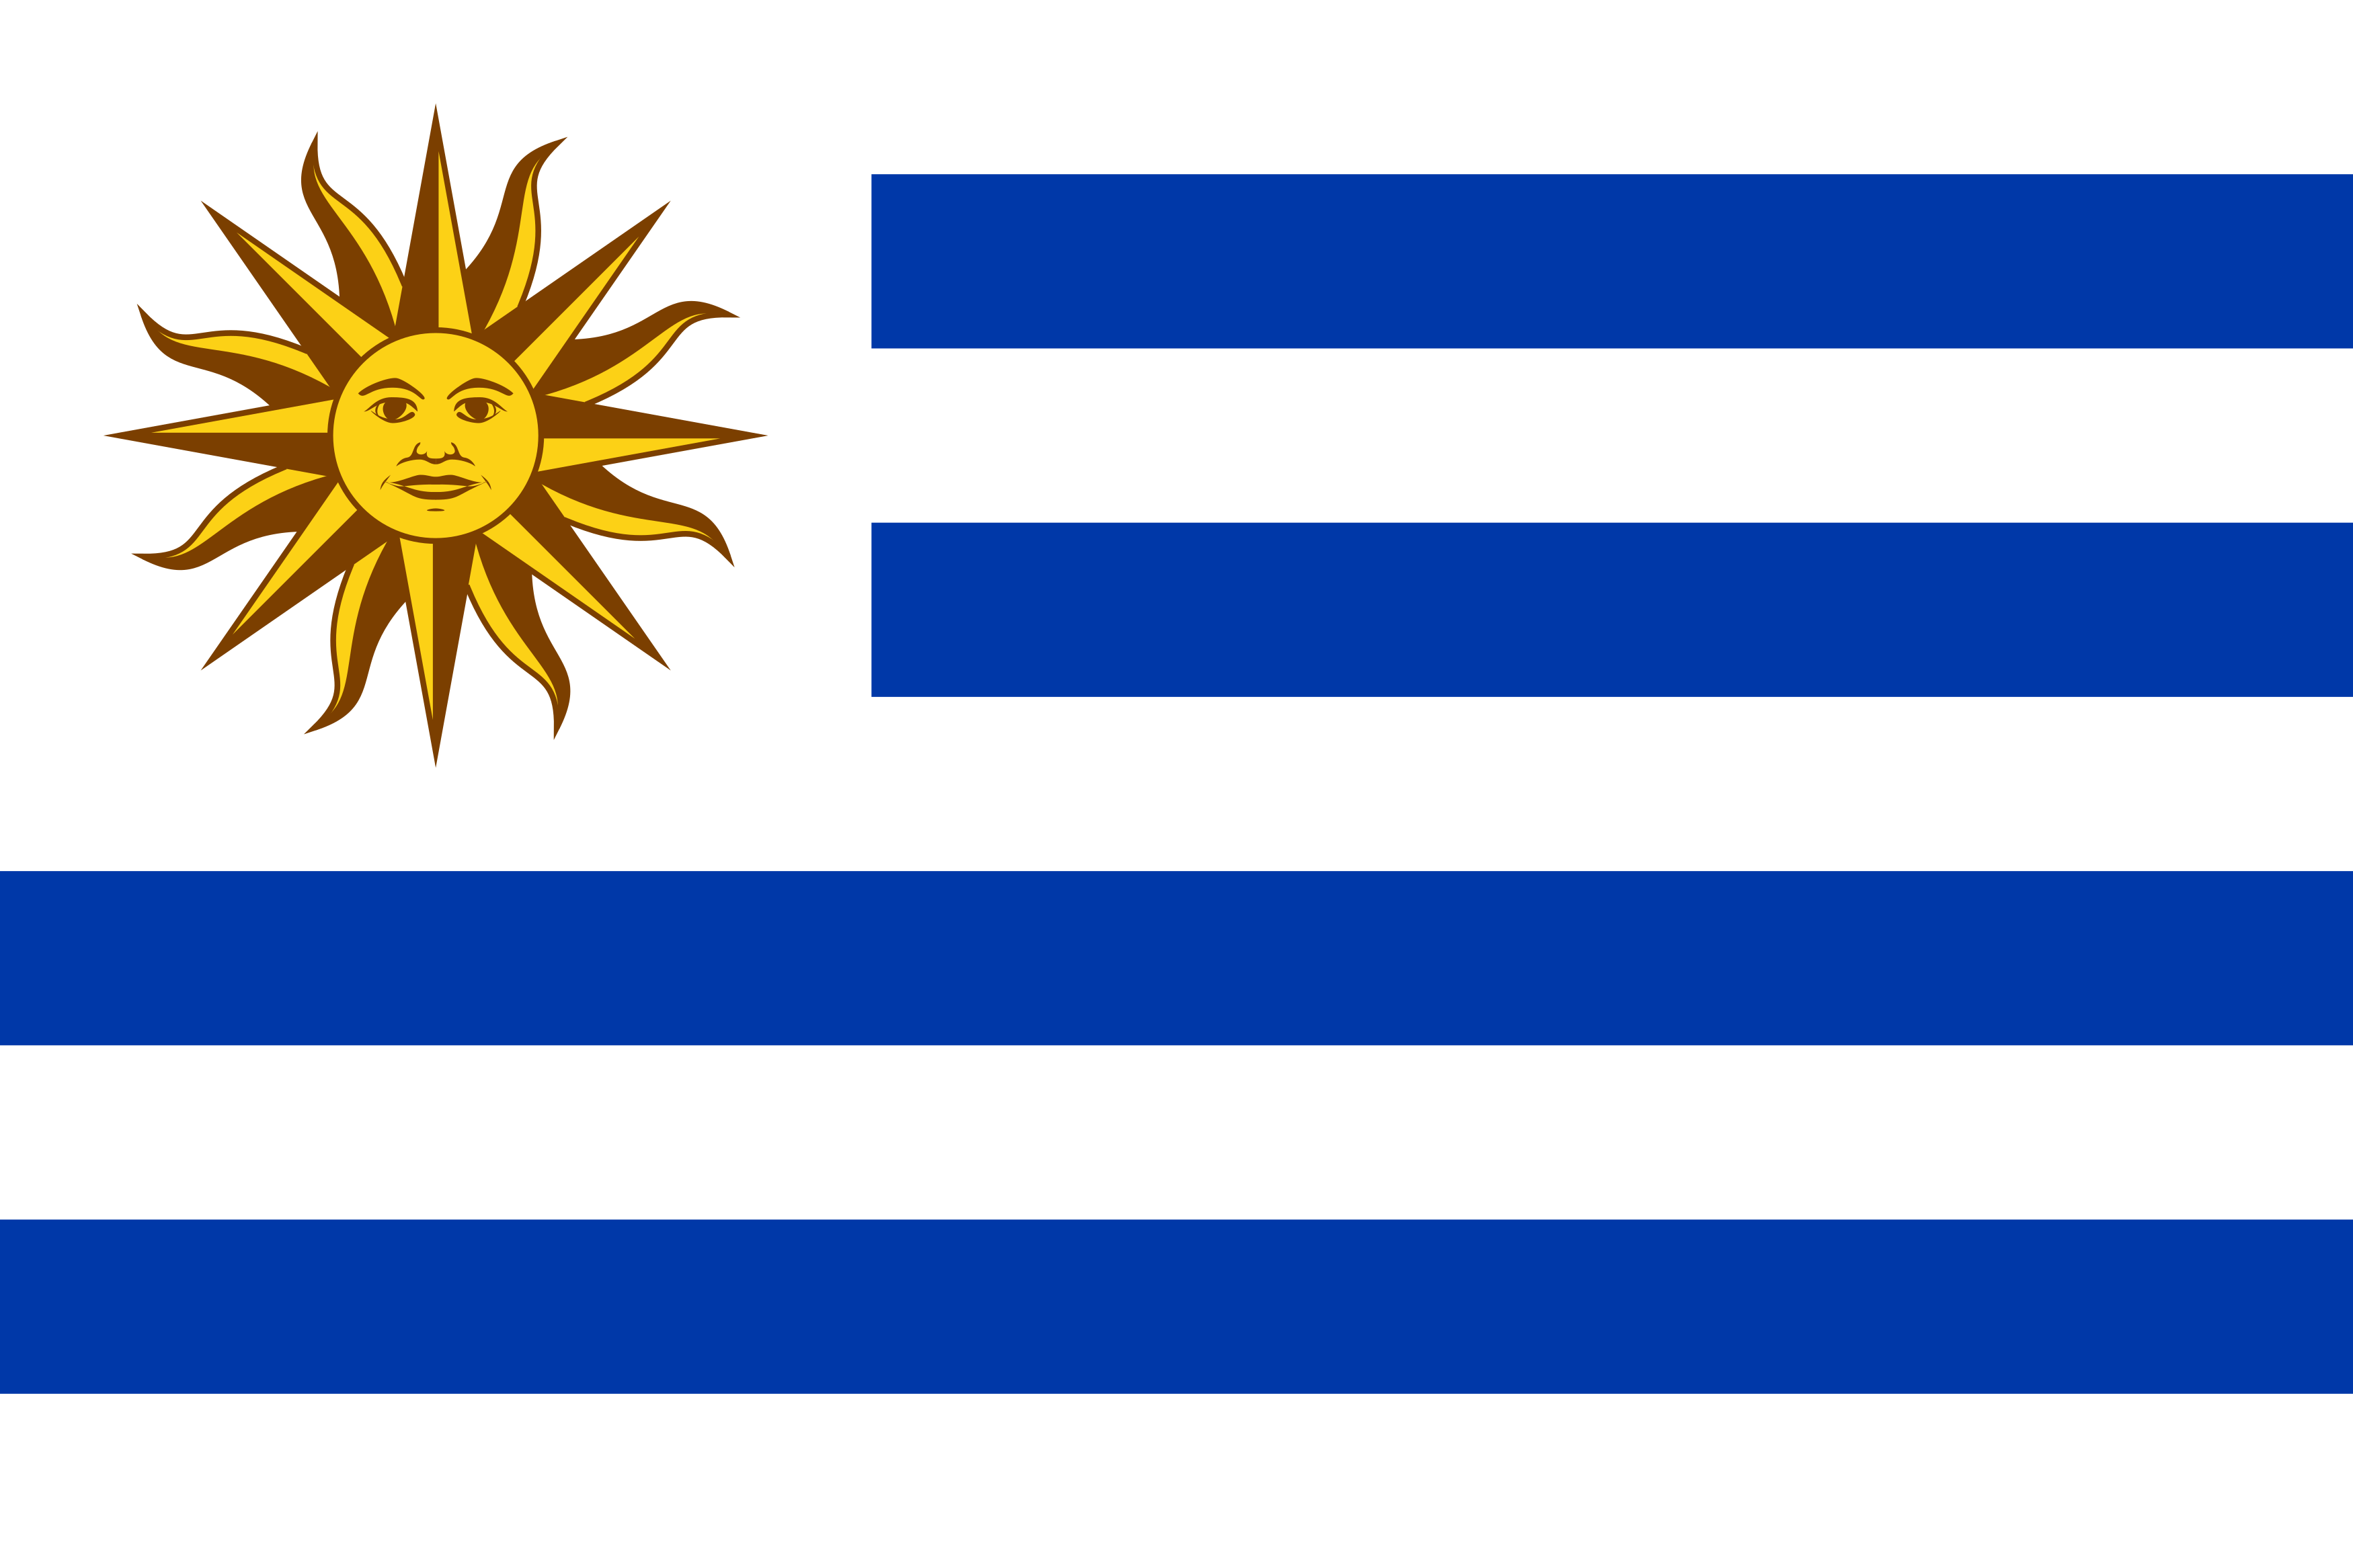 Bandeira do Uruguai png.